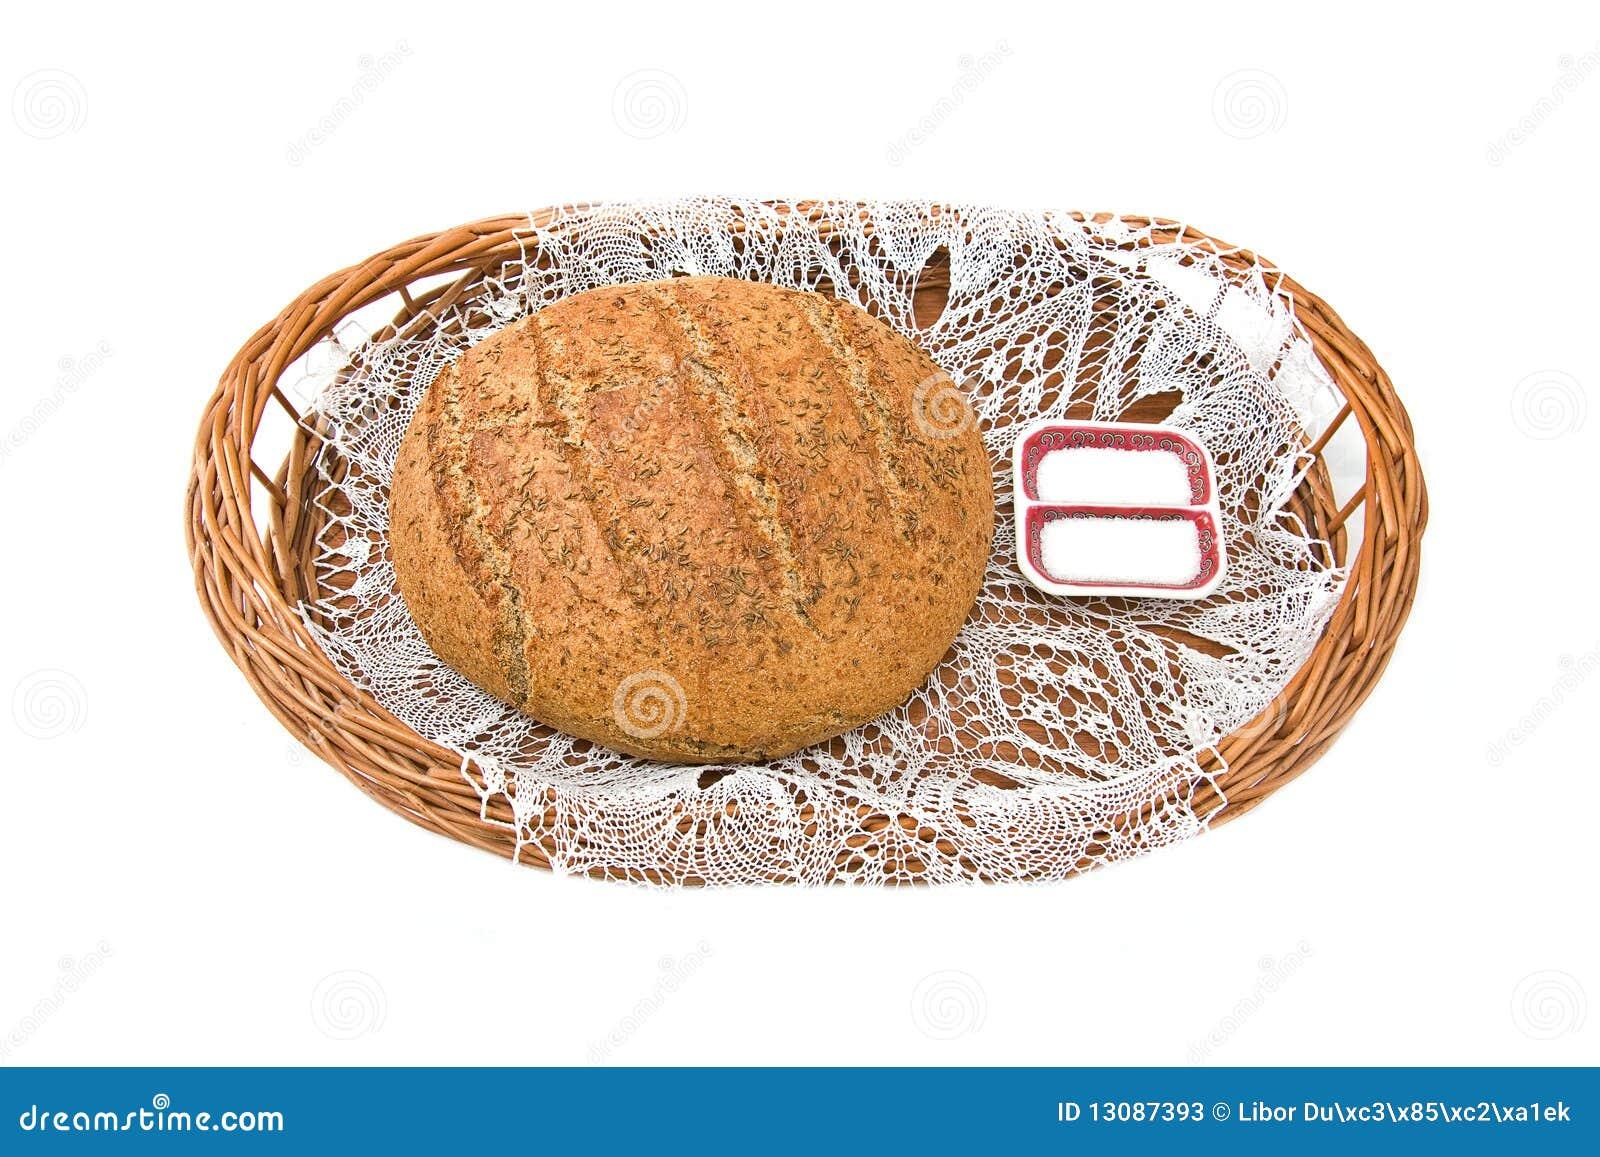 The Bread of Salt, by NVM Gonzalez